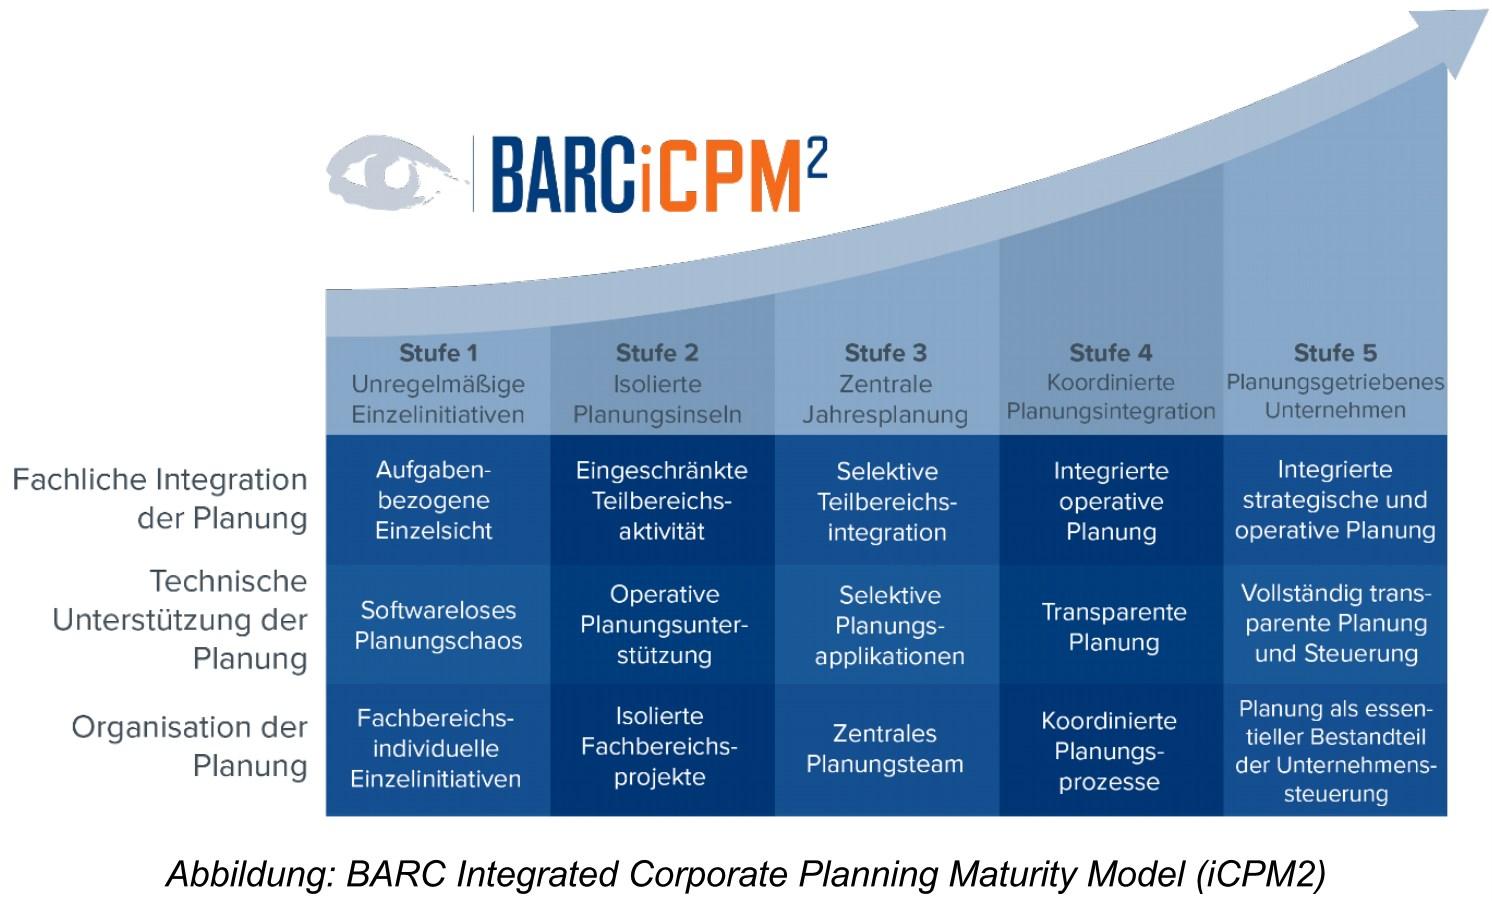 grafik-barc-integrierte-unternehmensplanung-reifegrad